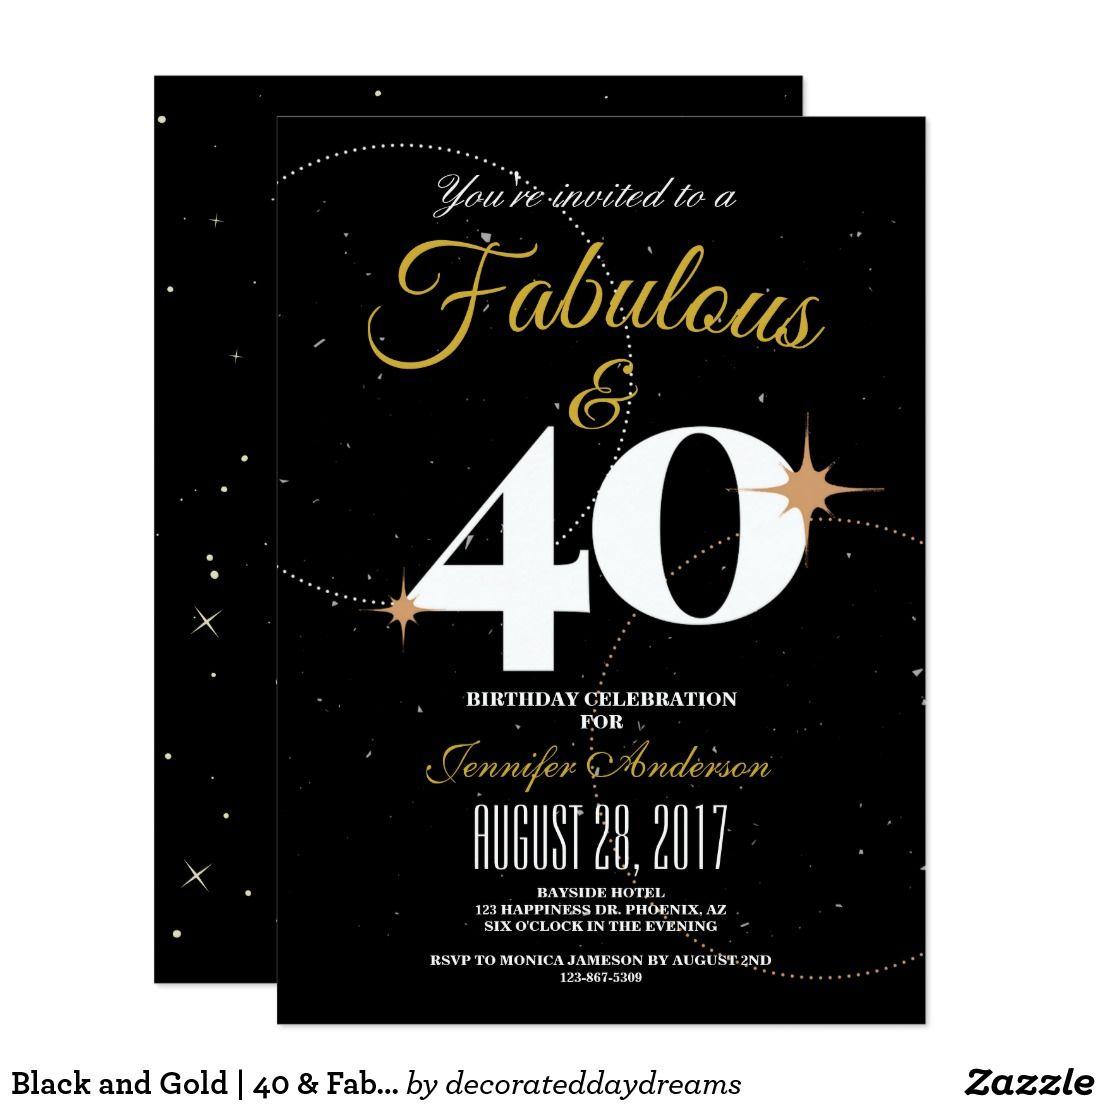 Black and Gold 40 & Fabulous Birthday Invitation